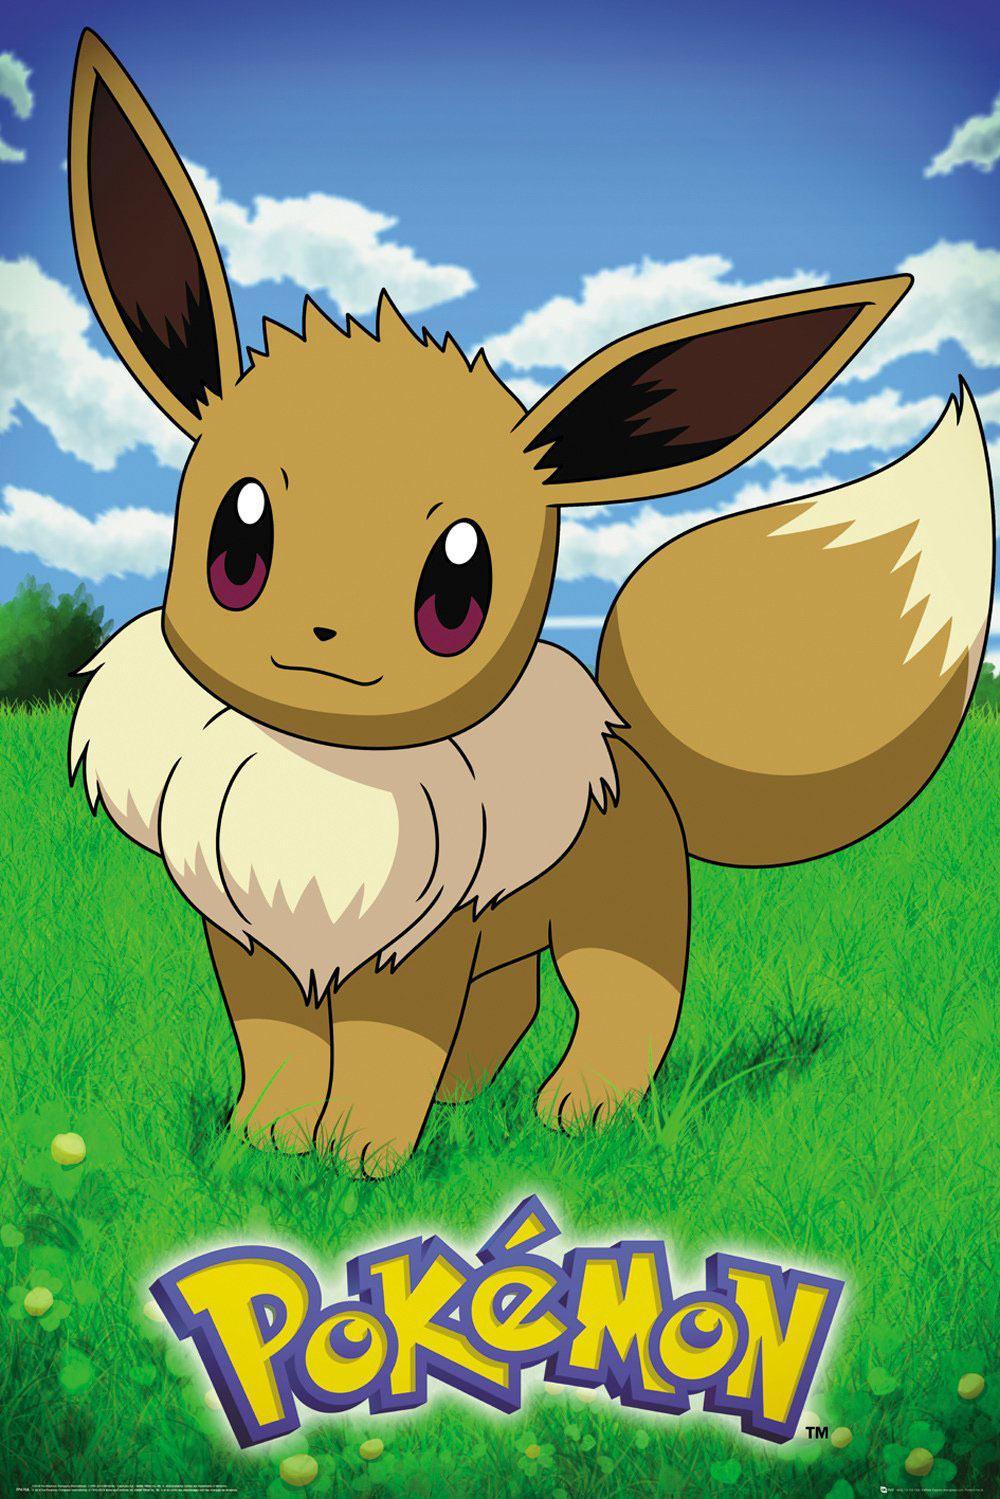 Pokémon Poster Pack Eevee 61 x 91 cm (5)